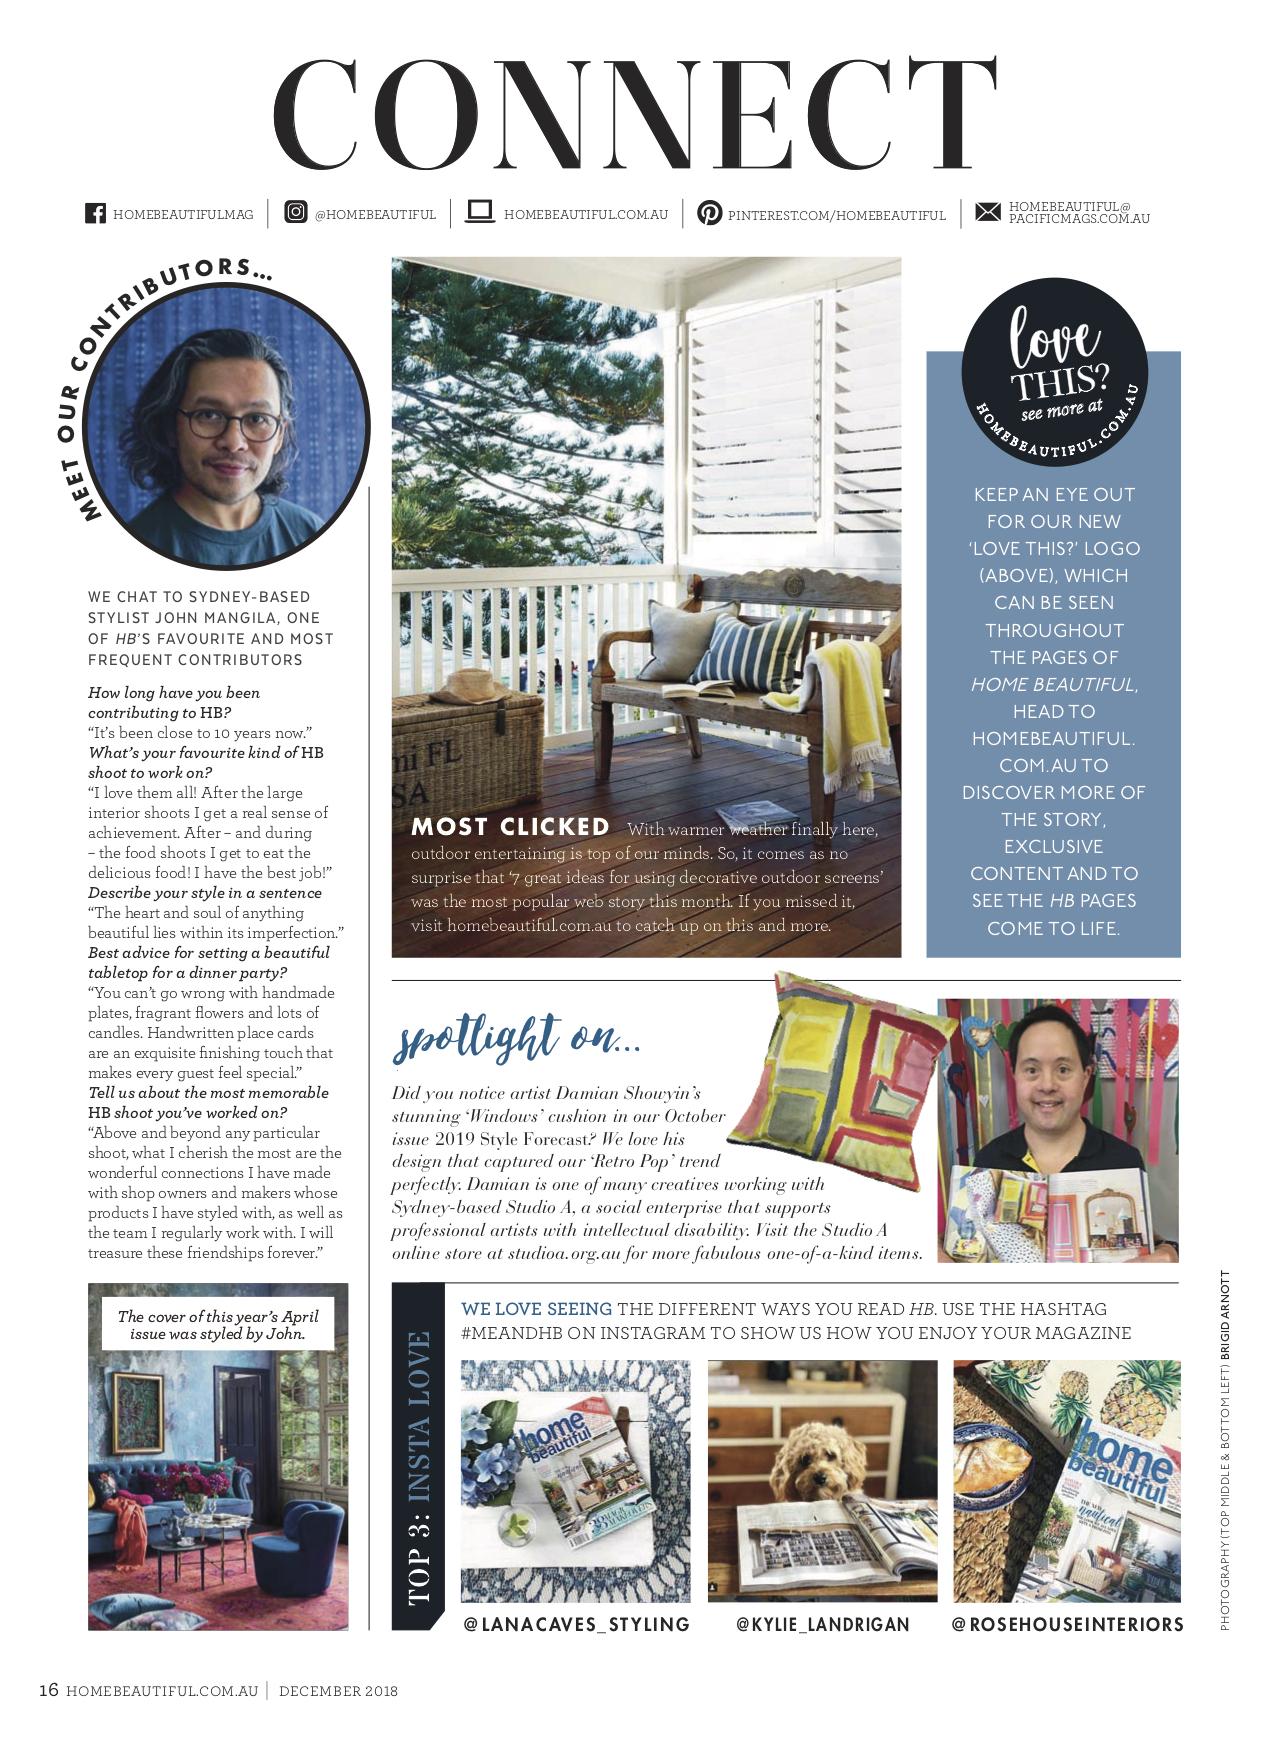 Home Beautiful, December 2018 Issue   Damian Showyin holding the October 2018 issue of Home Beautiful which featured his 'Windows' cushion design.